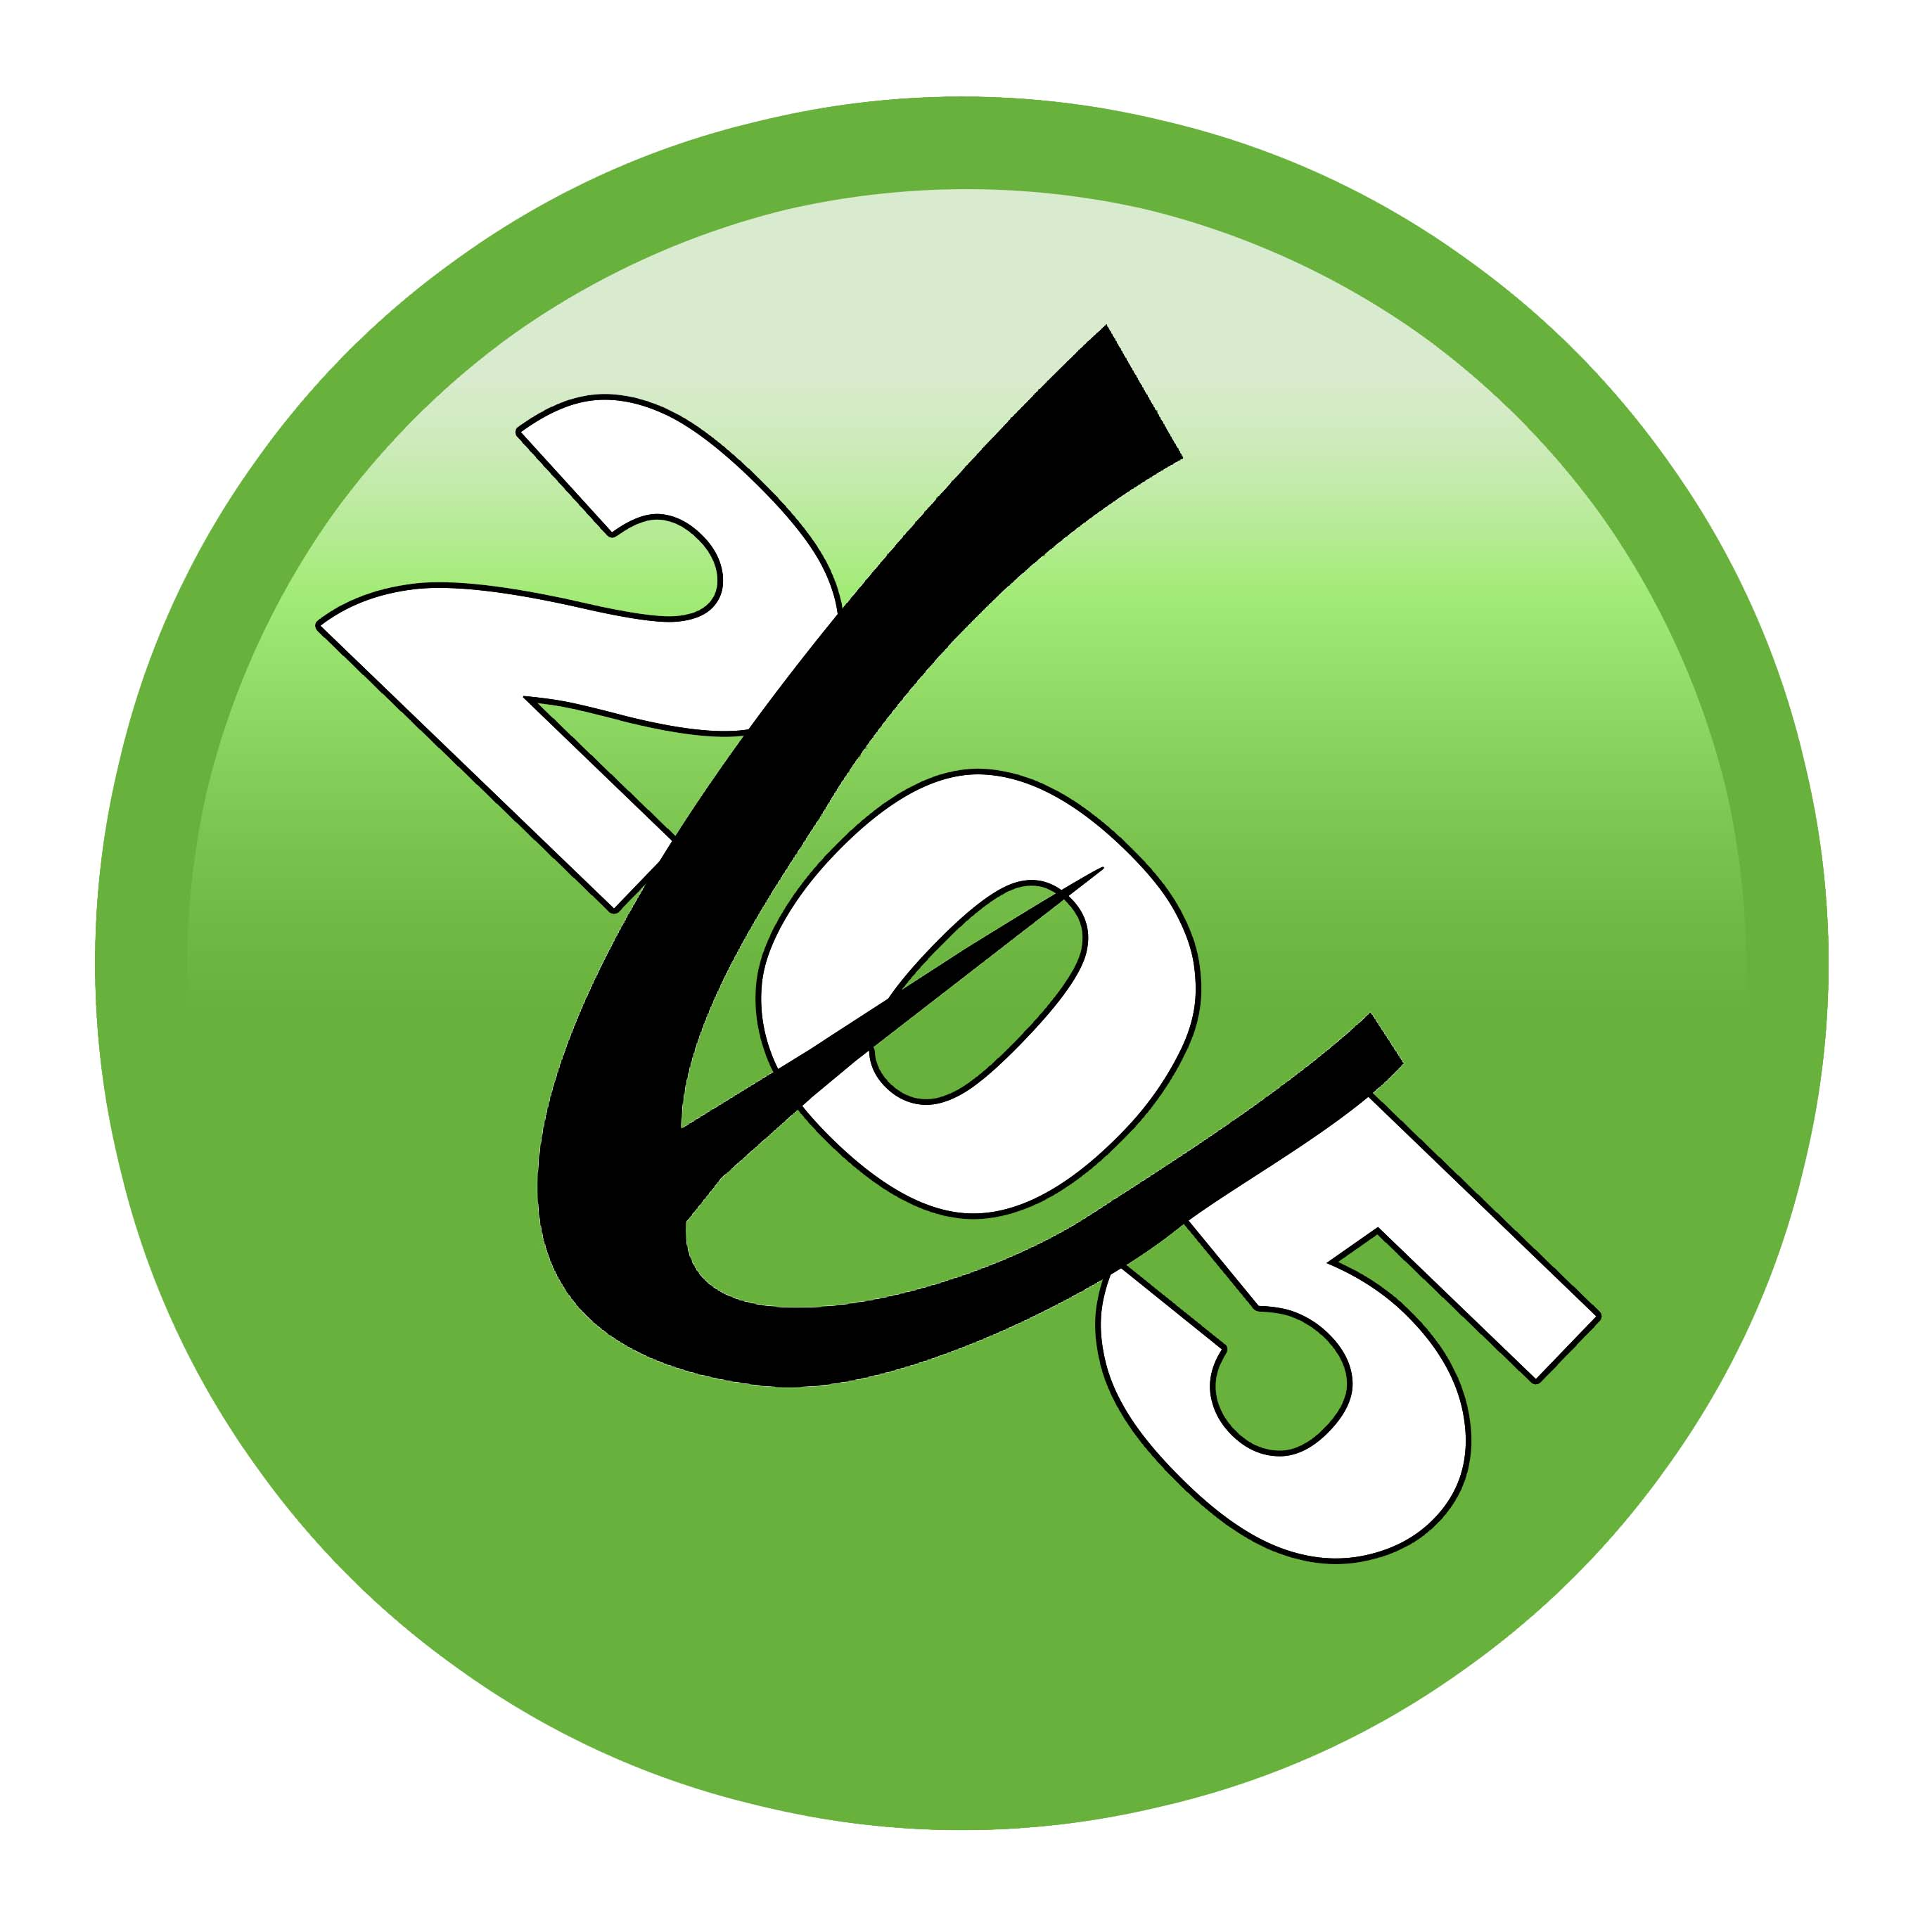 Logo e205 n